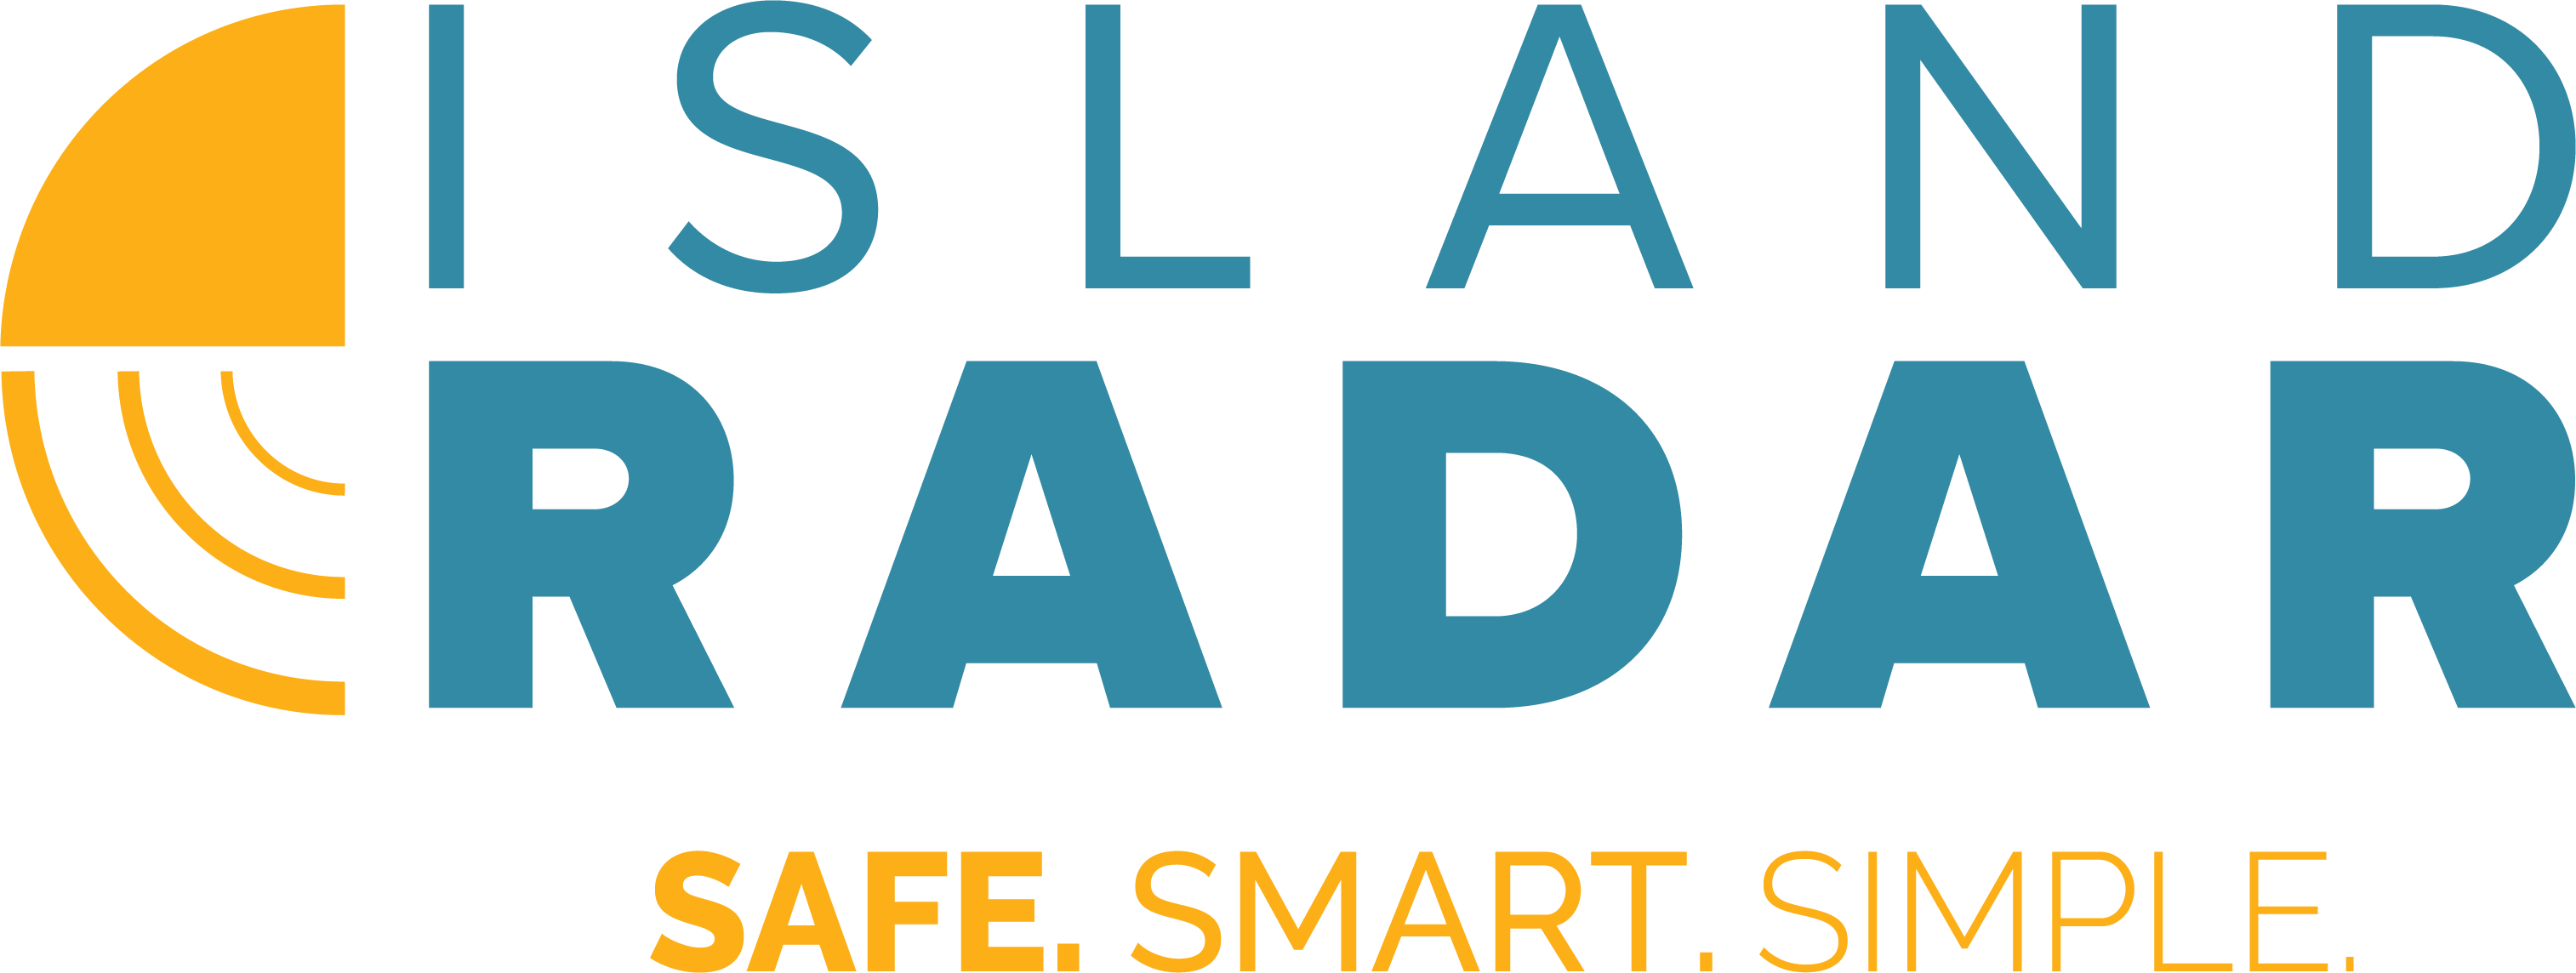 Island Radar logo